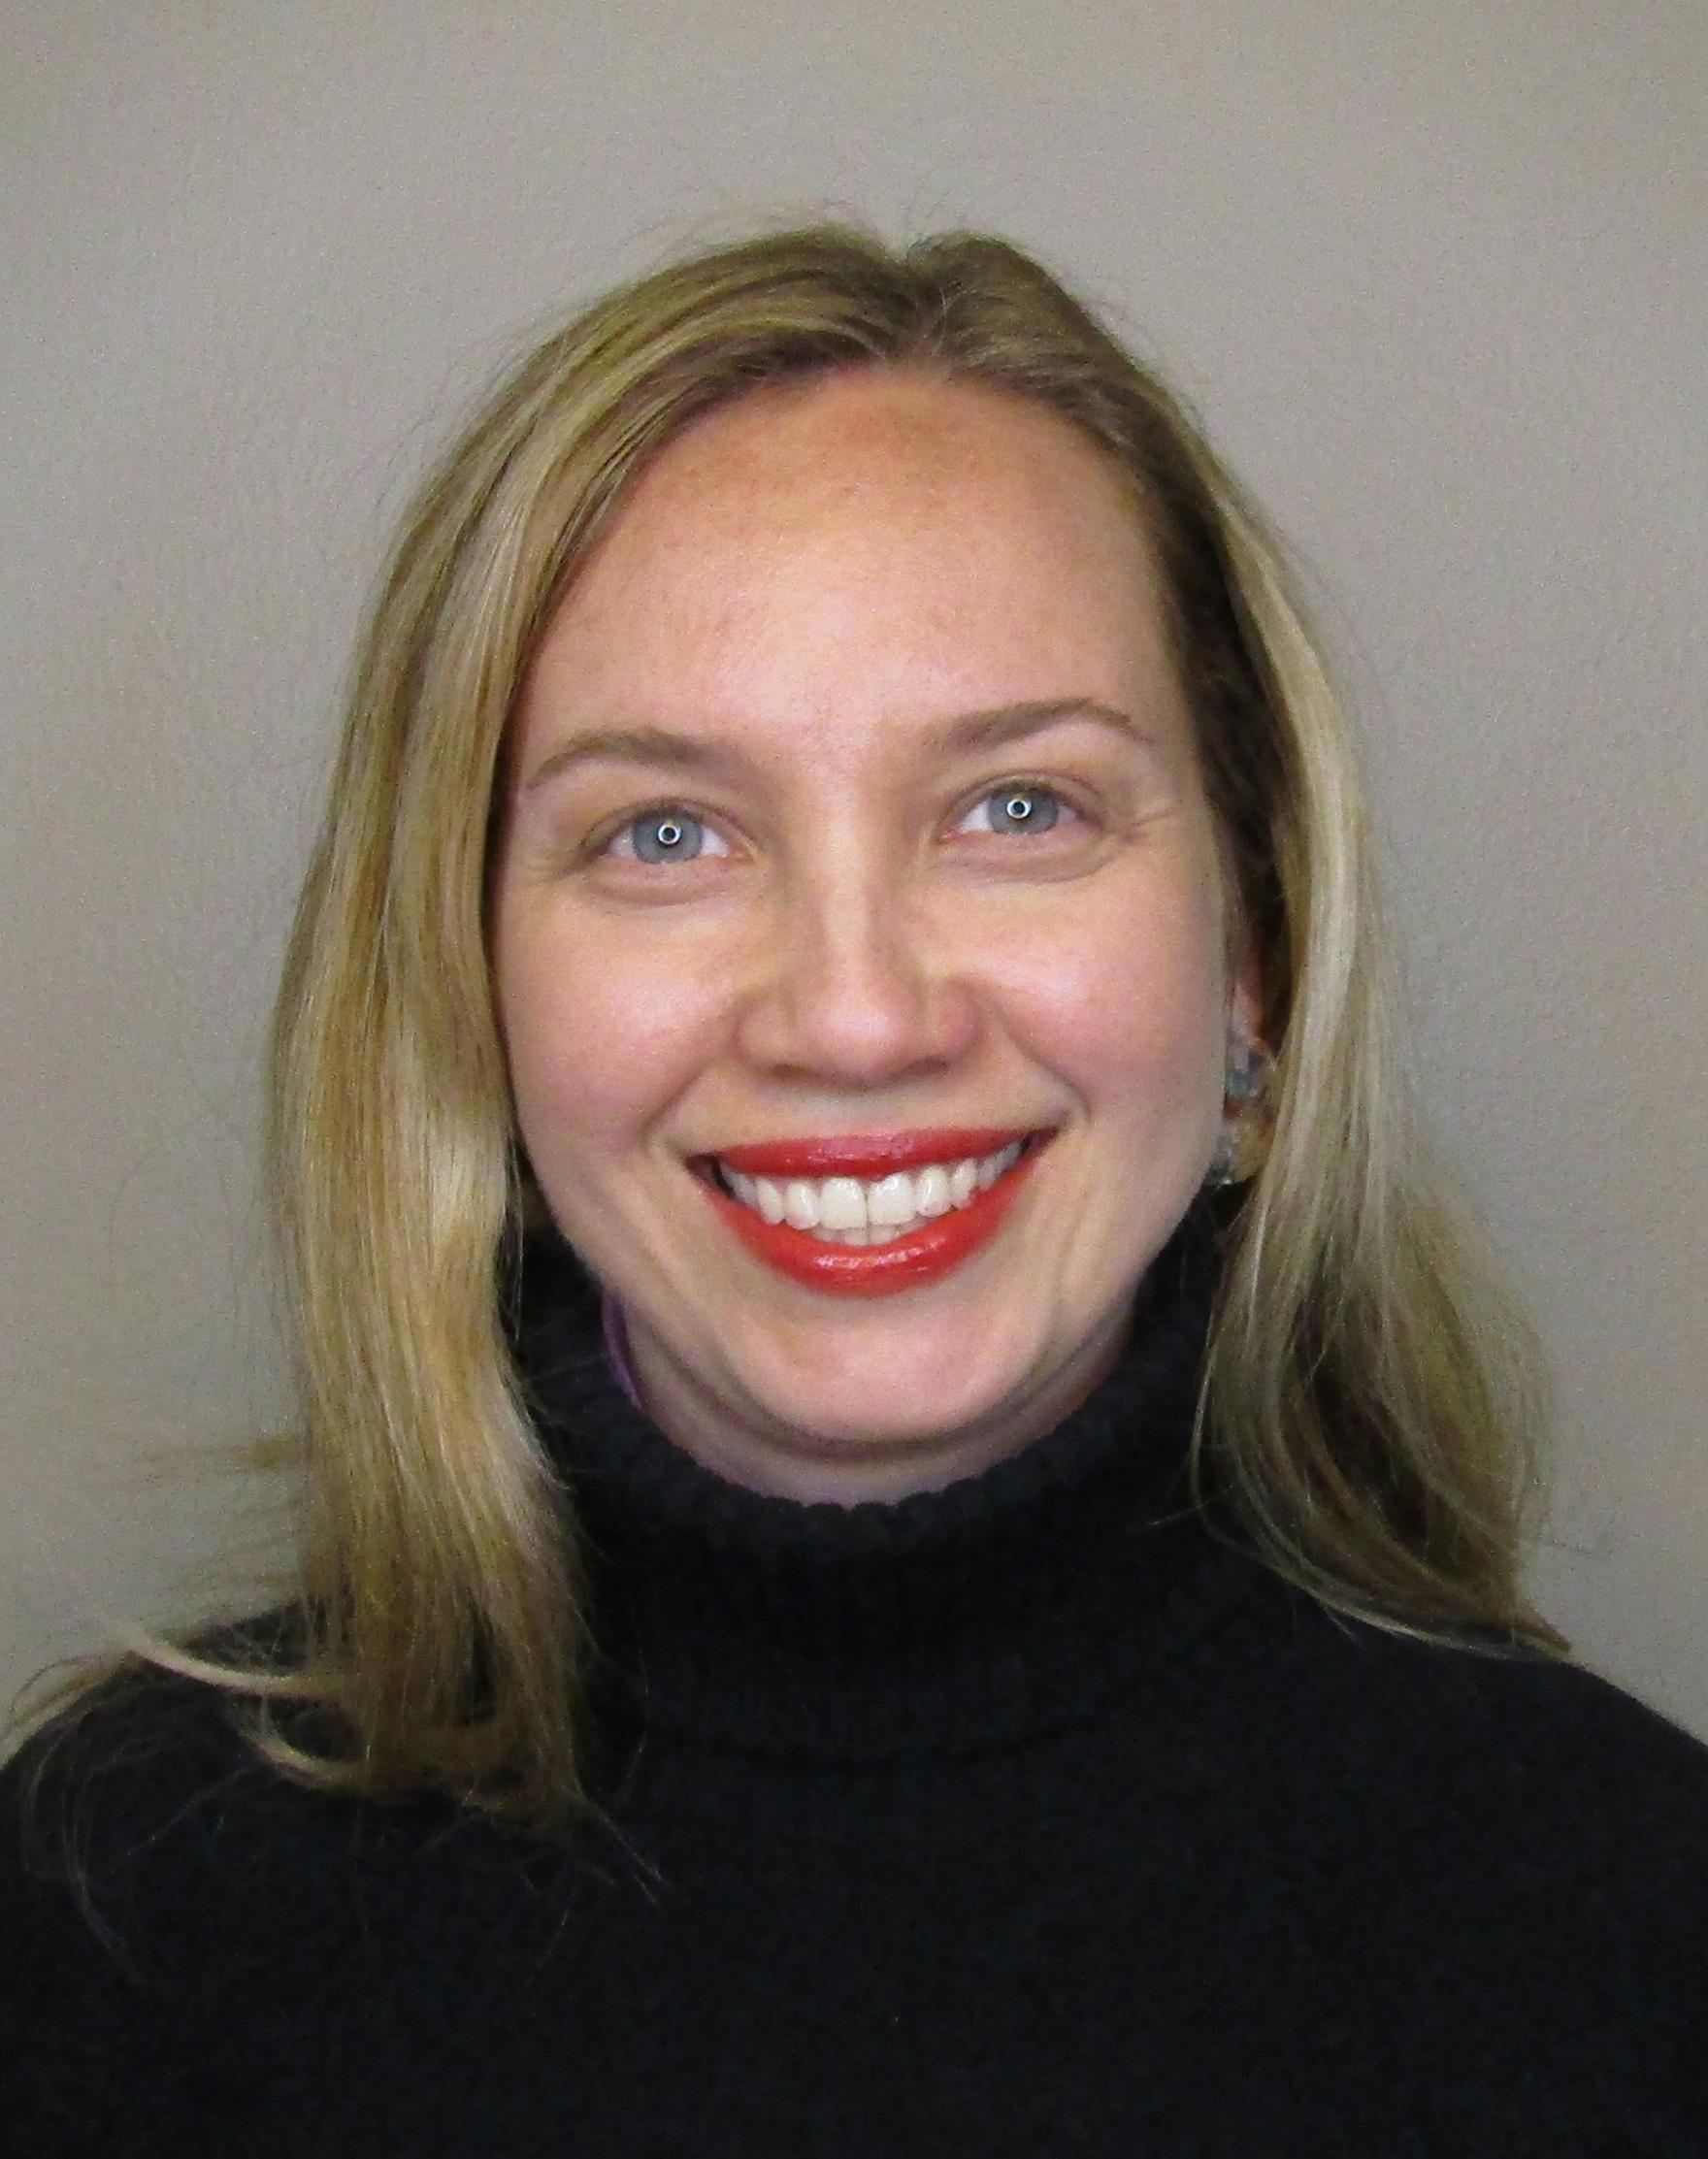 Katerina Goldman - MA, LAC